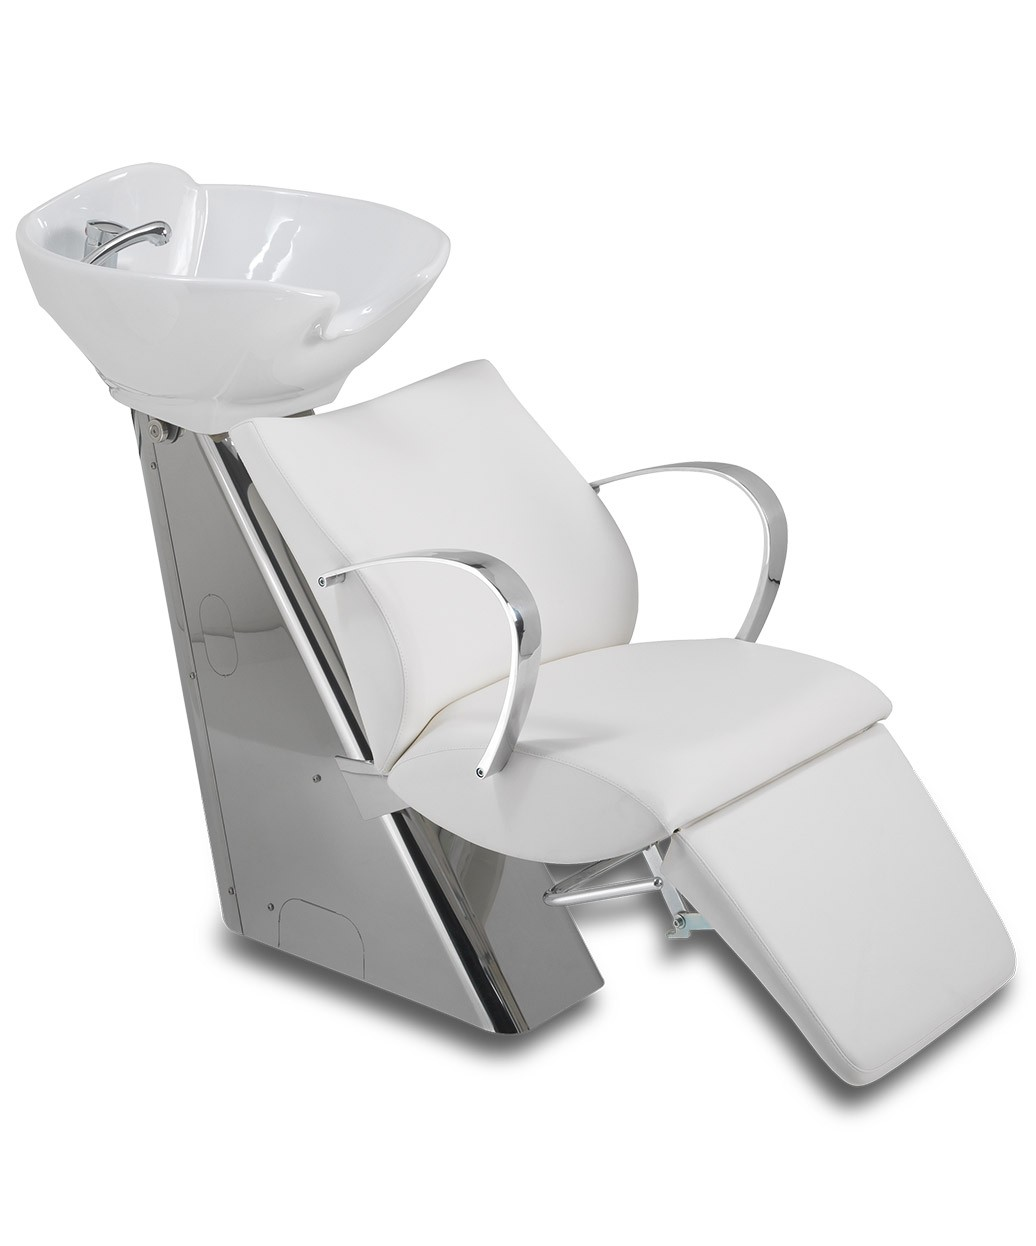 belmont barber chair parts zero gravity costco takara sh 505 bahama backwash unit